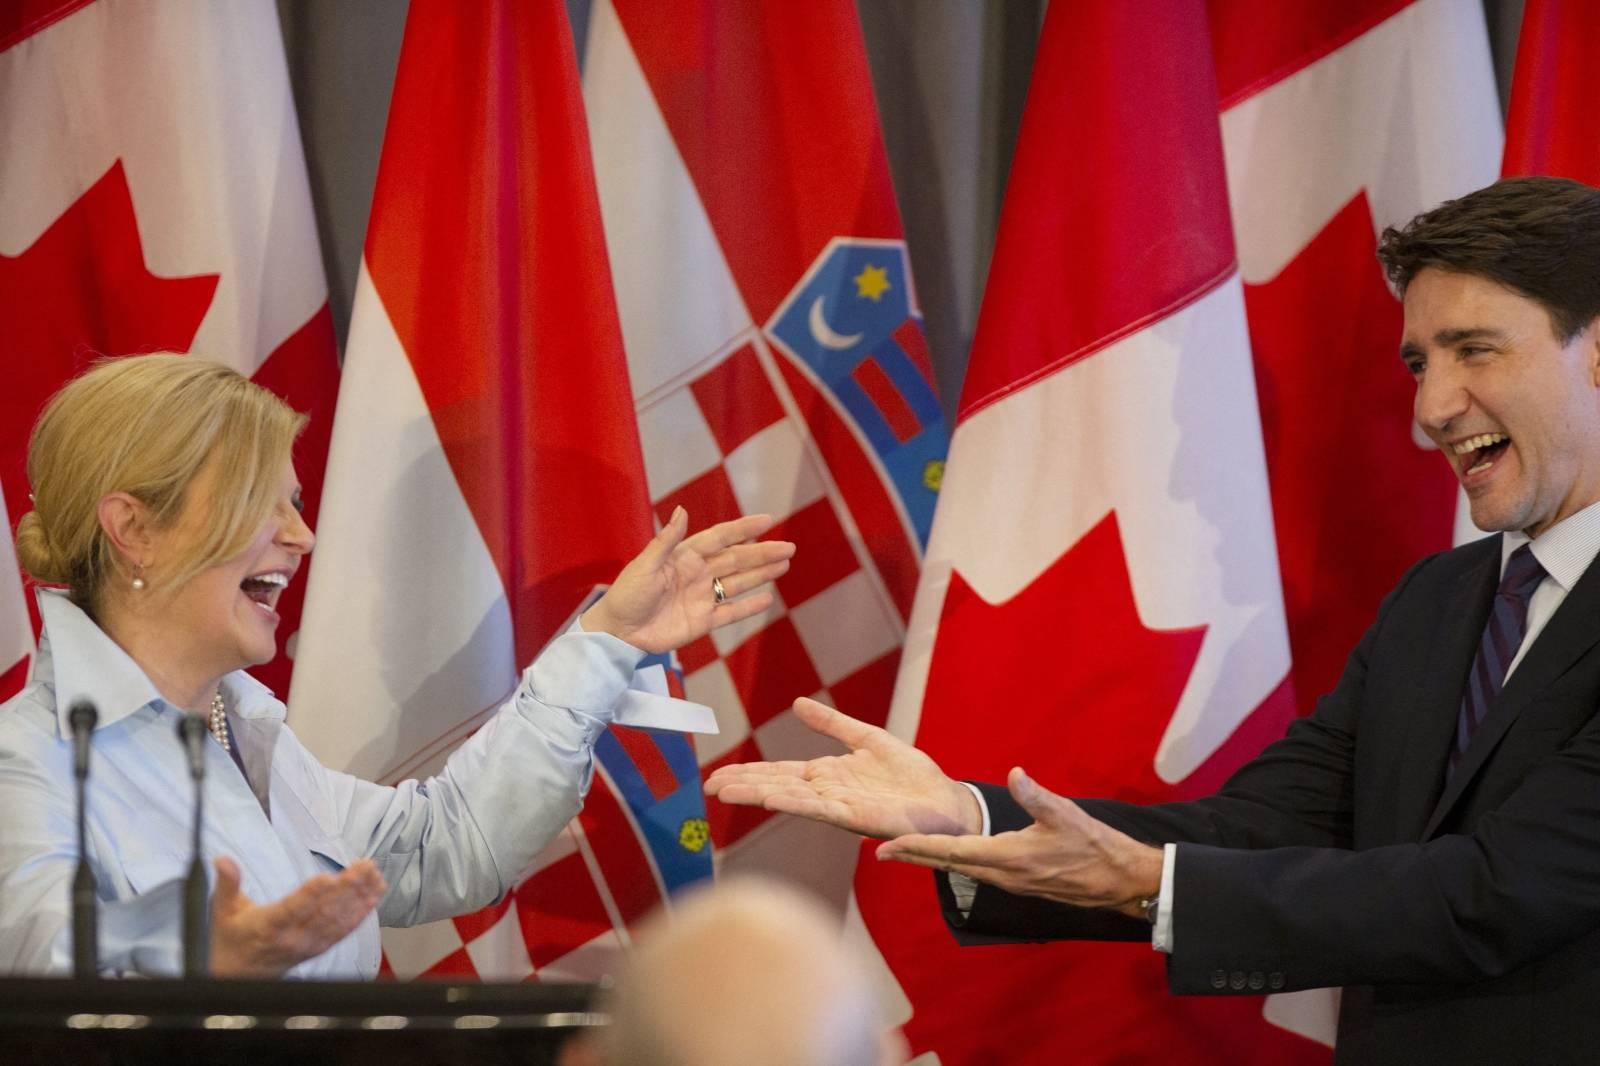 PM Trudeau Meets With Croatian President Grabar-Kitarovic - Hamilton